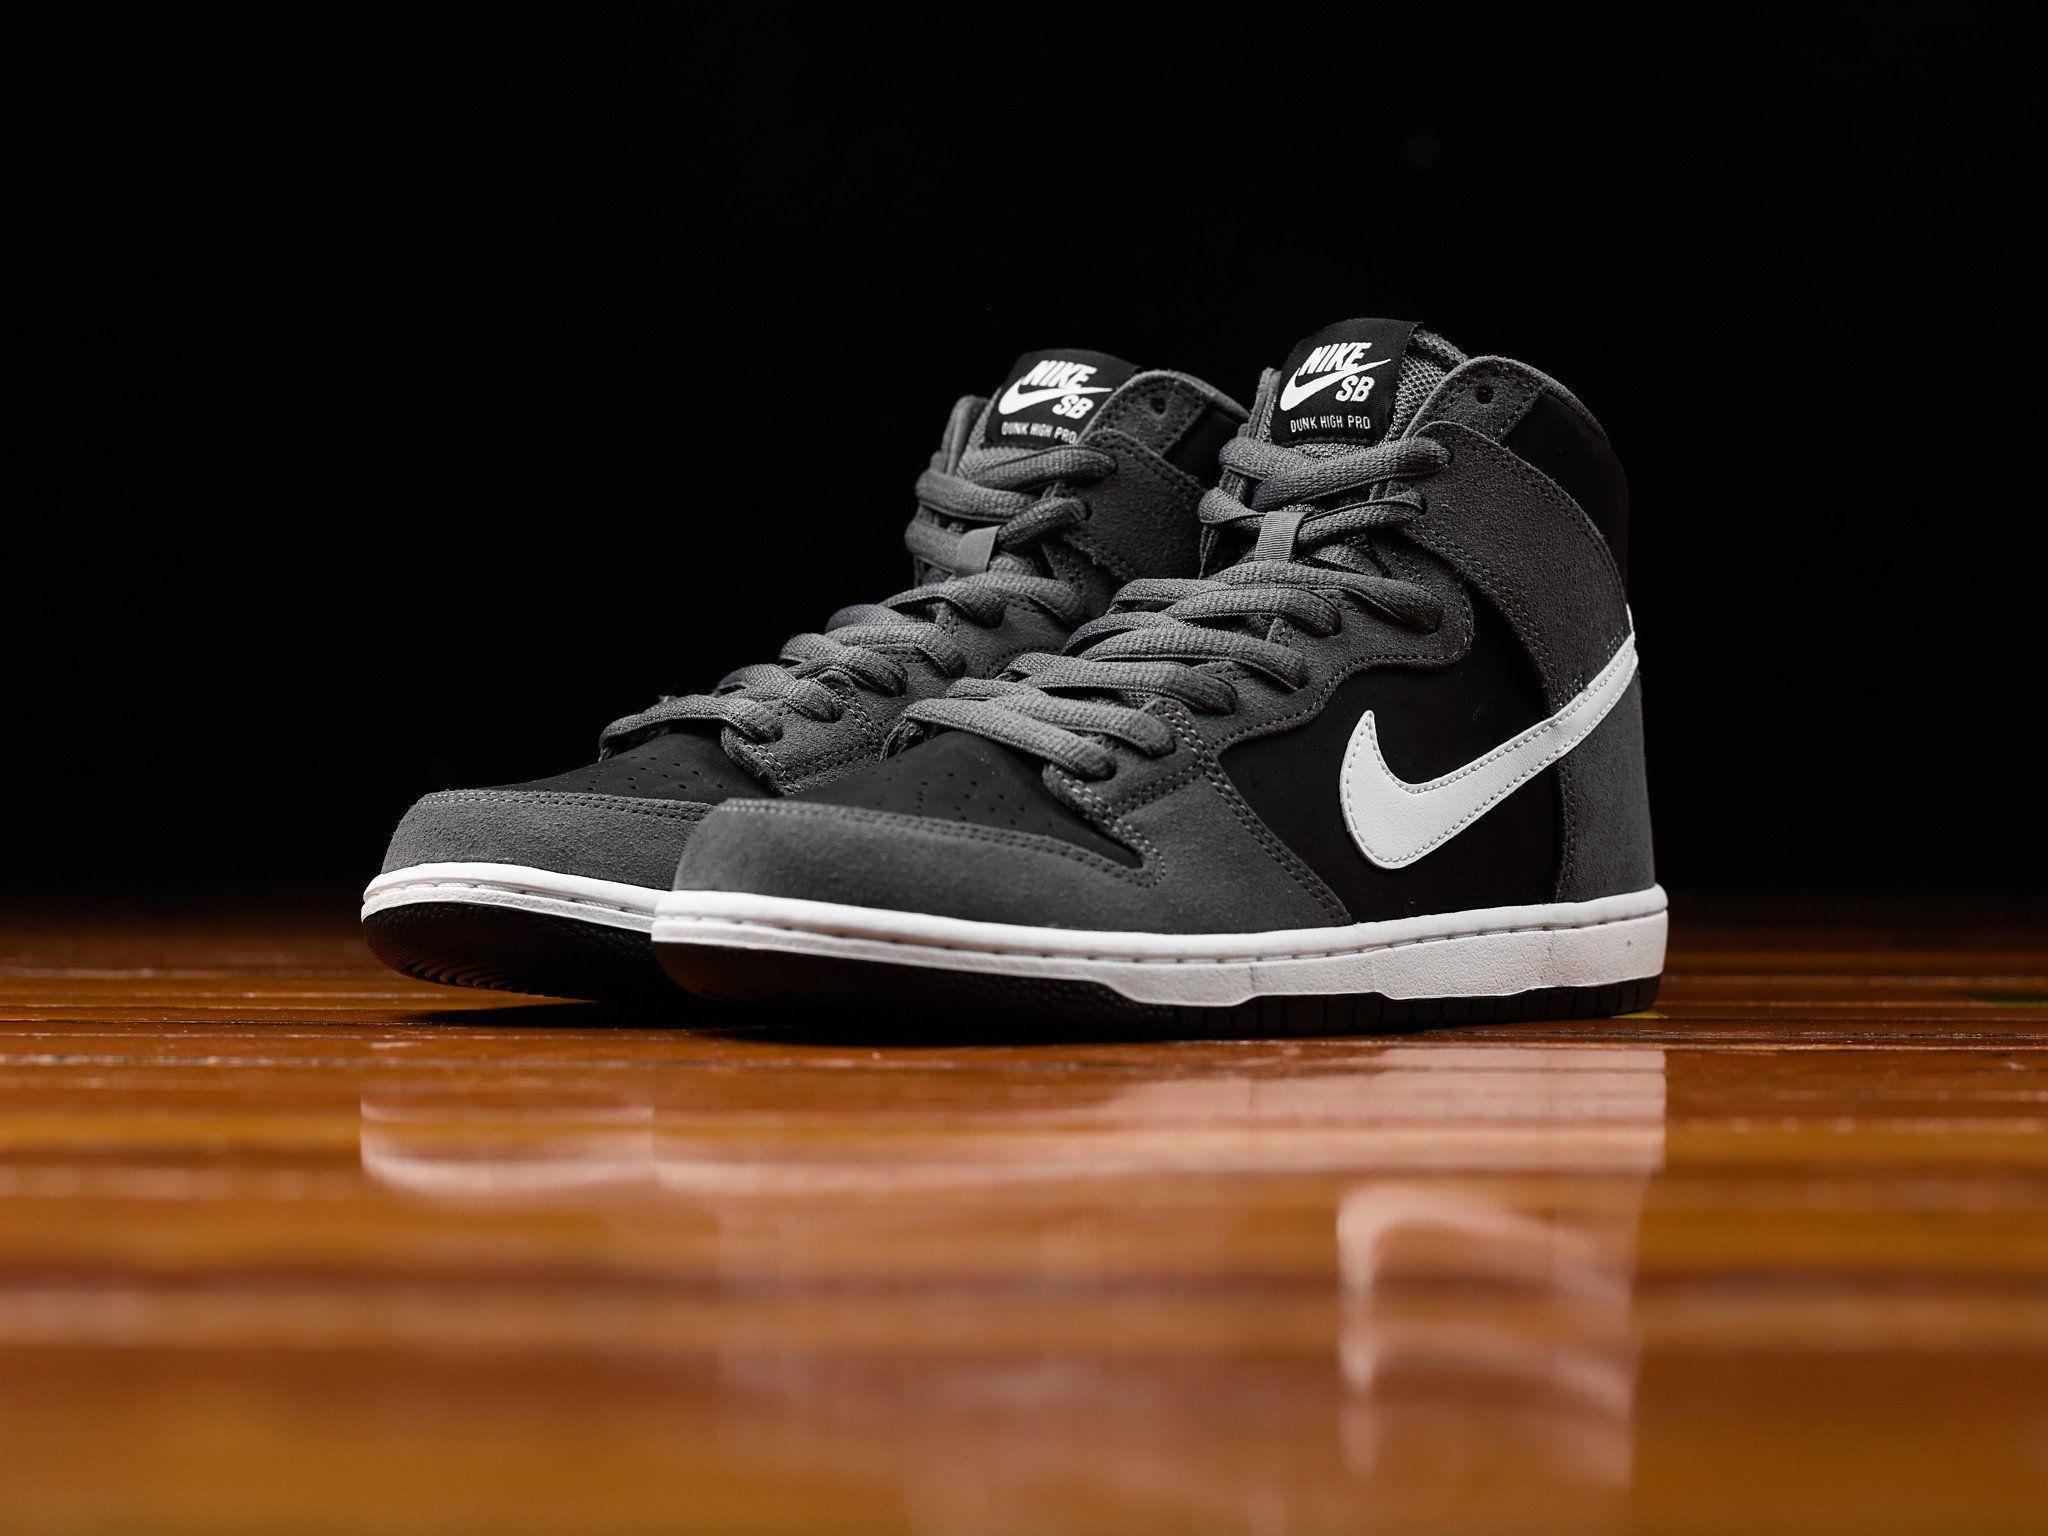 More Images Of The Nike SB Dunk High Pro Shadow O KicksOnFire